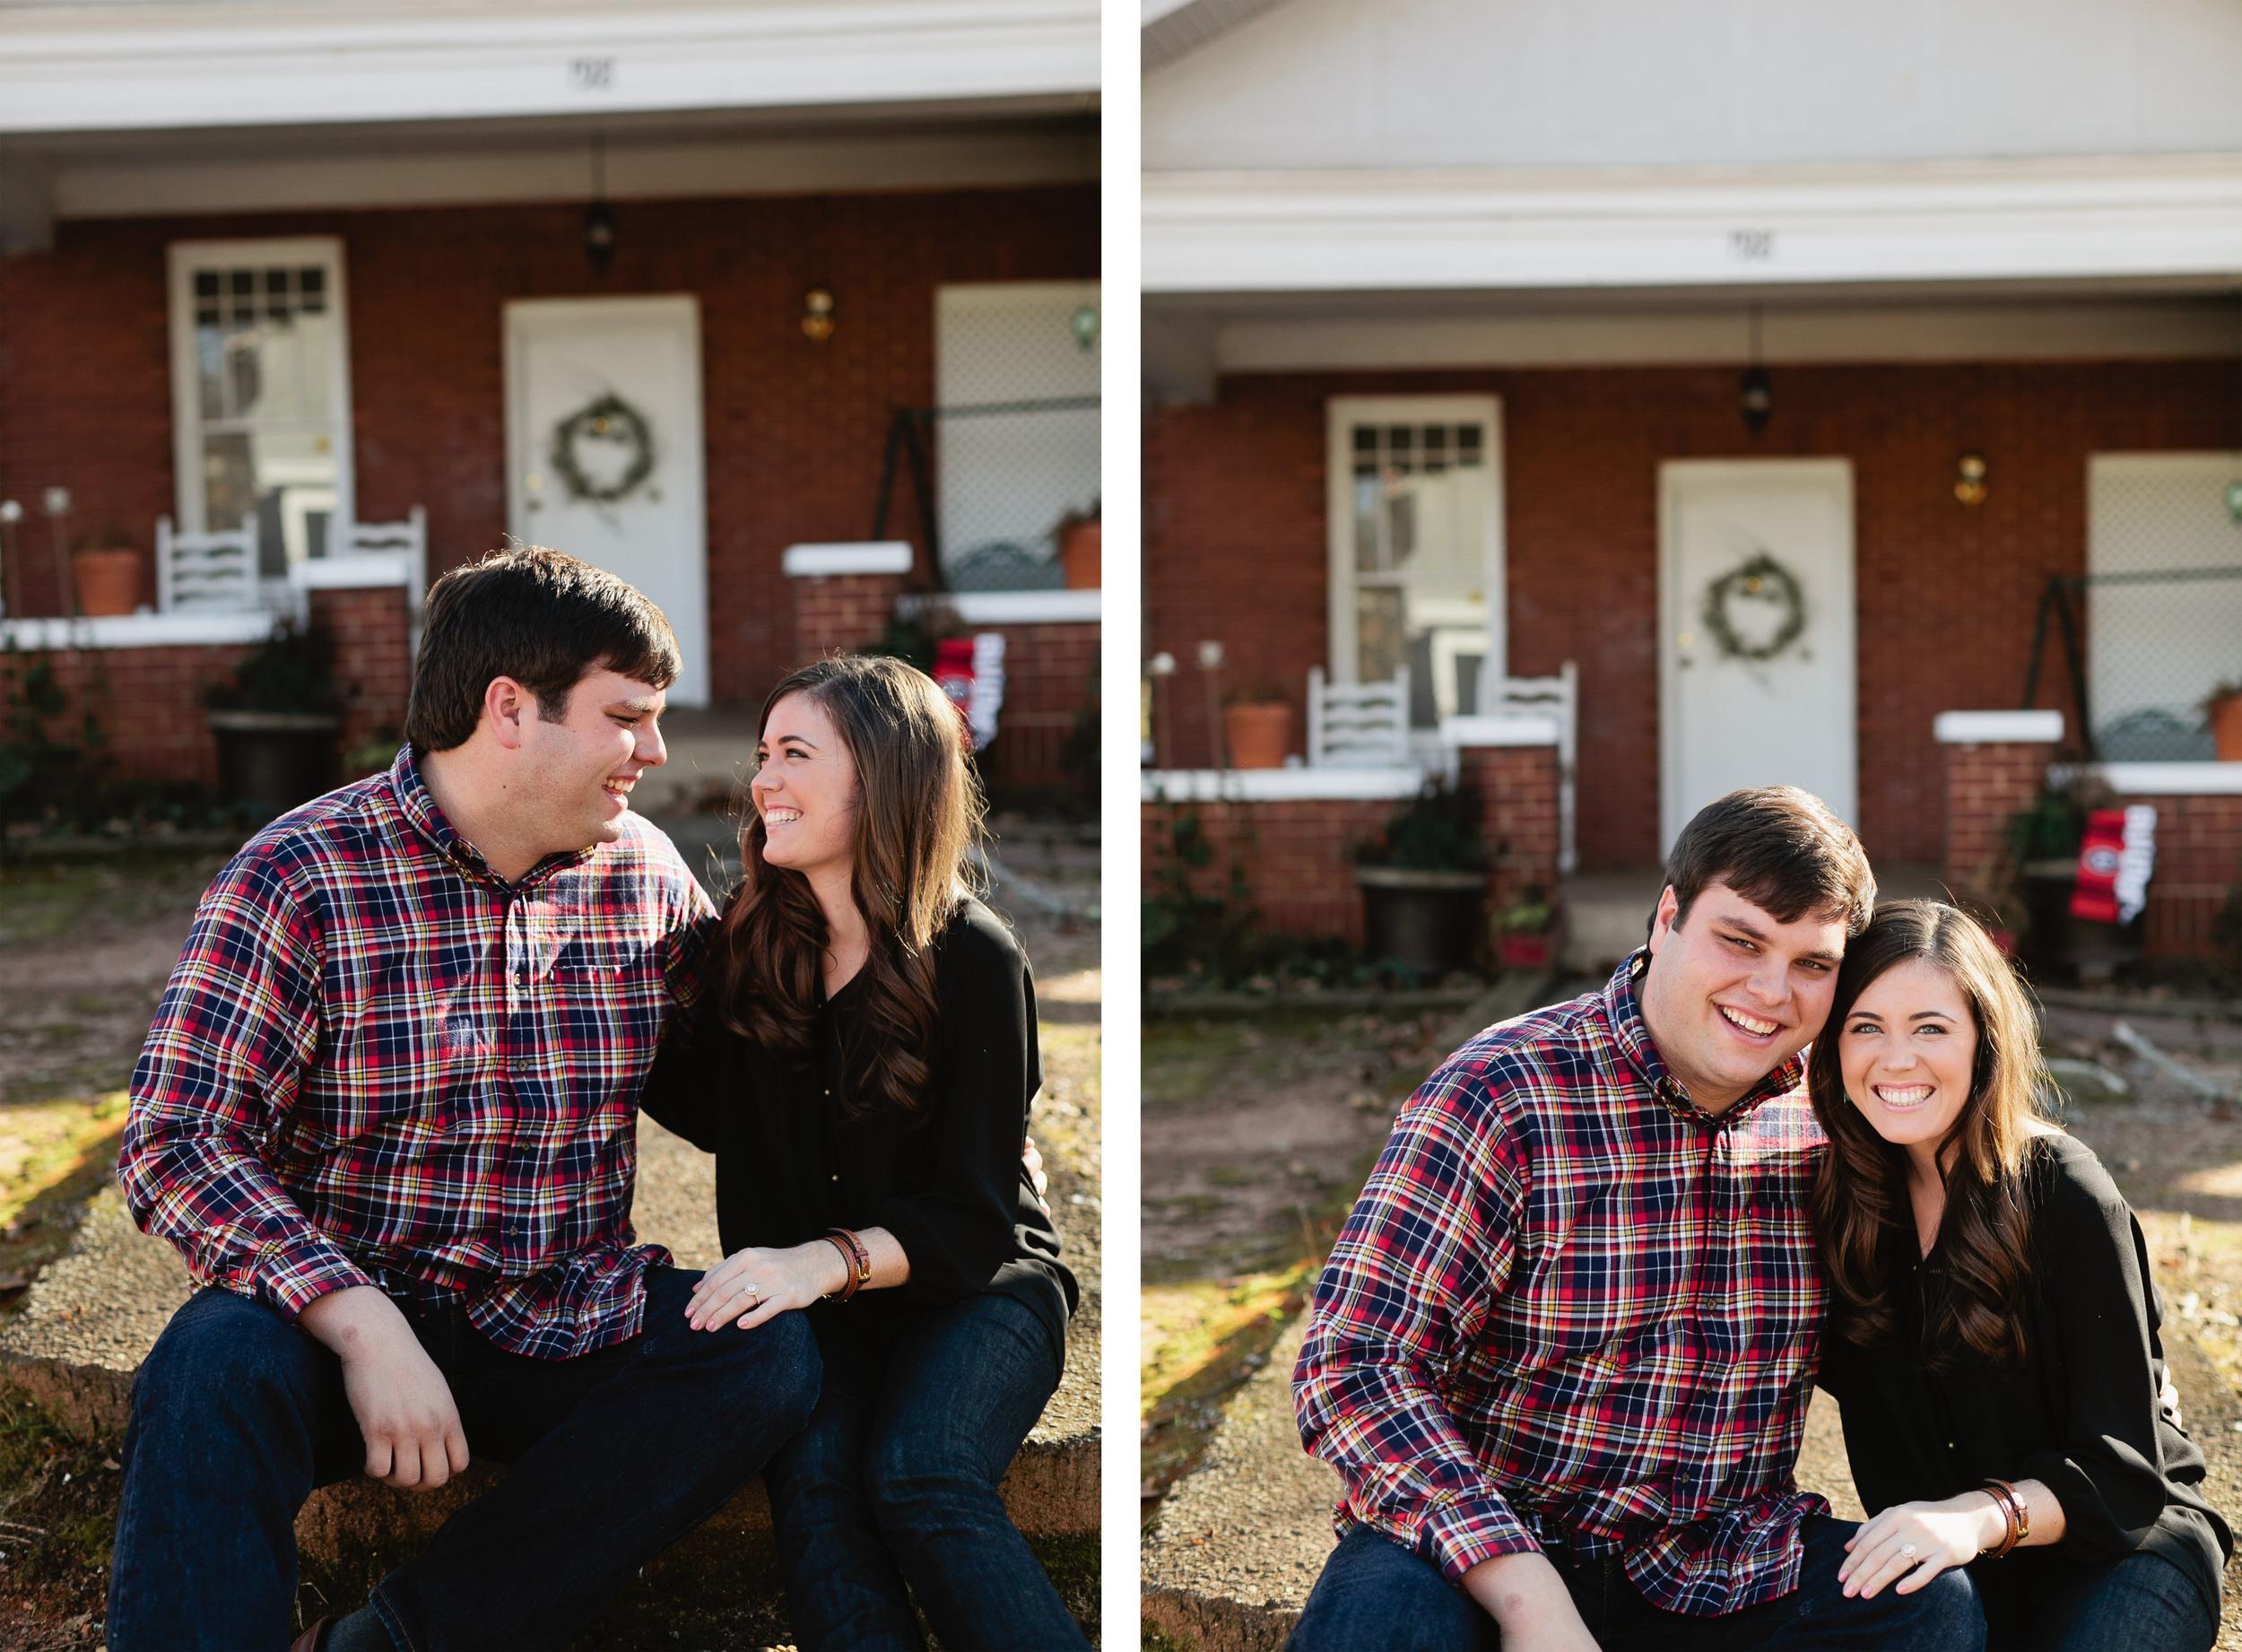 Atlanta-Engagement-Photographer-Kathryn-McCrary-Photography-Anna-Lynn-Raleigh-Collage-2.jpg